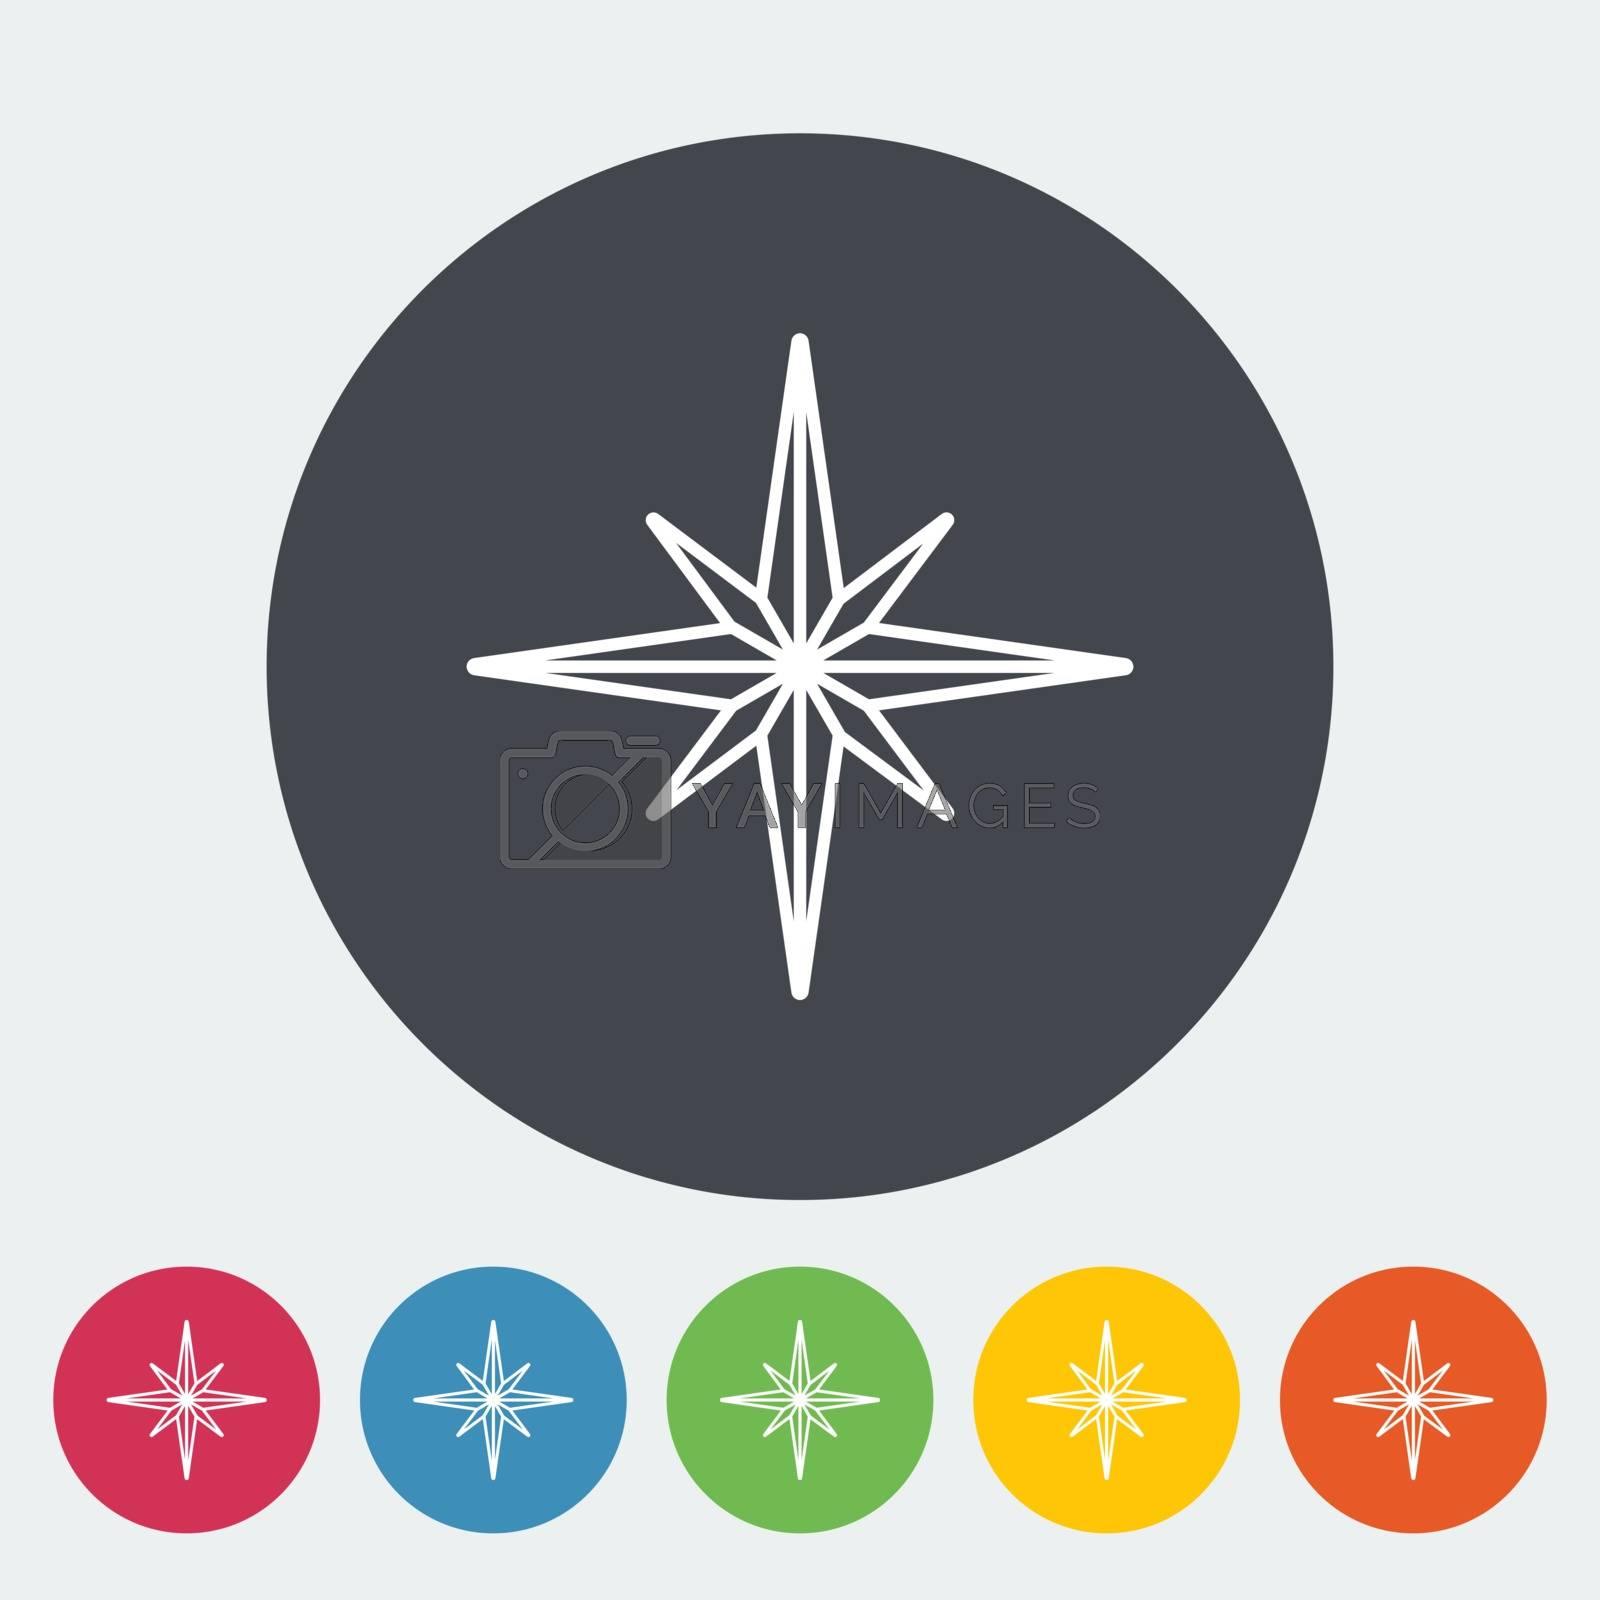 Wind rose. Single flat icon on the circle. Vector illustration.